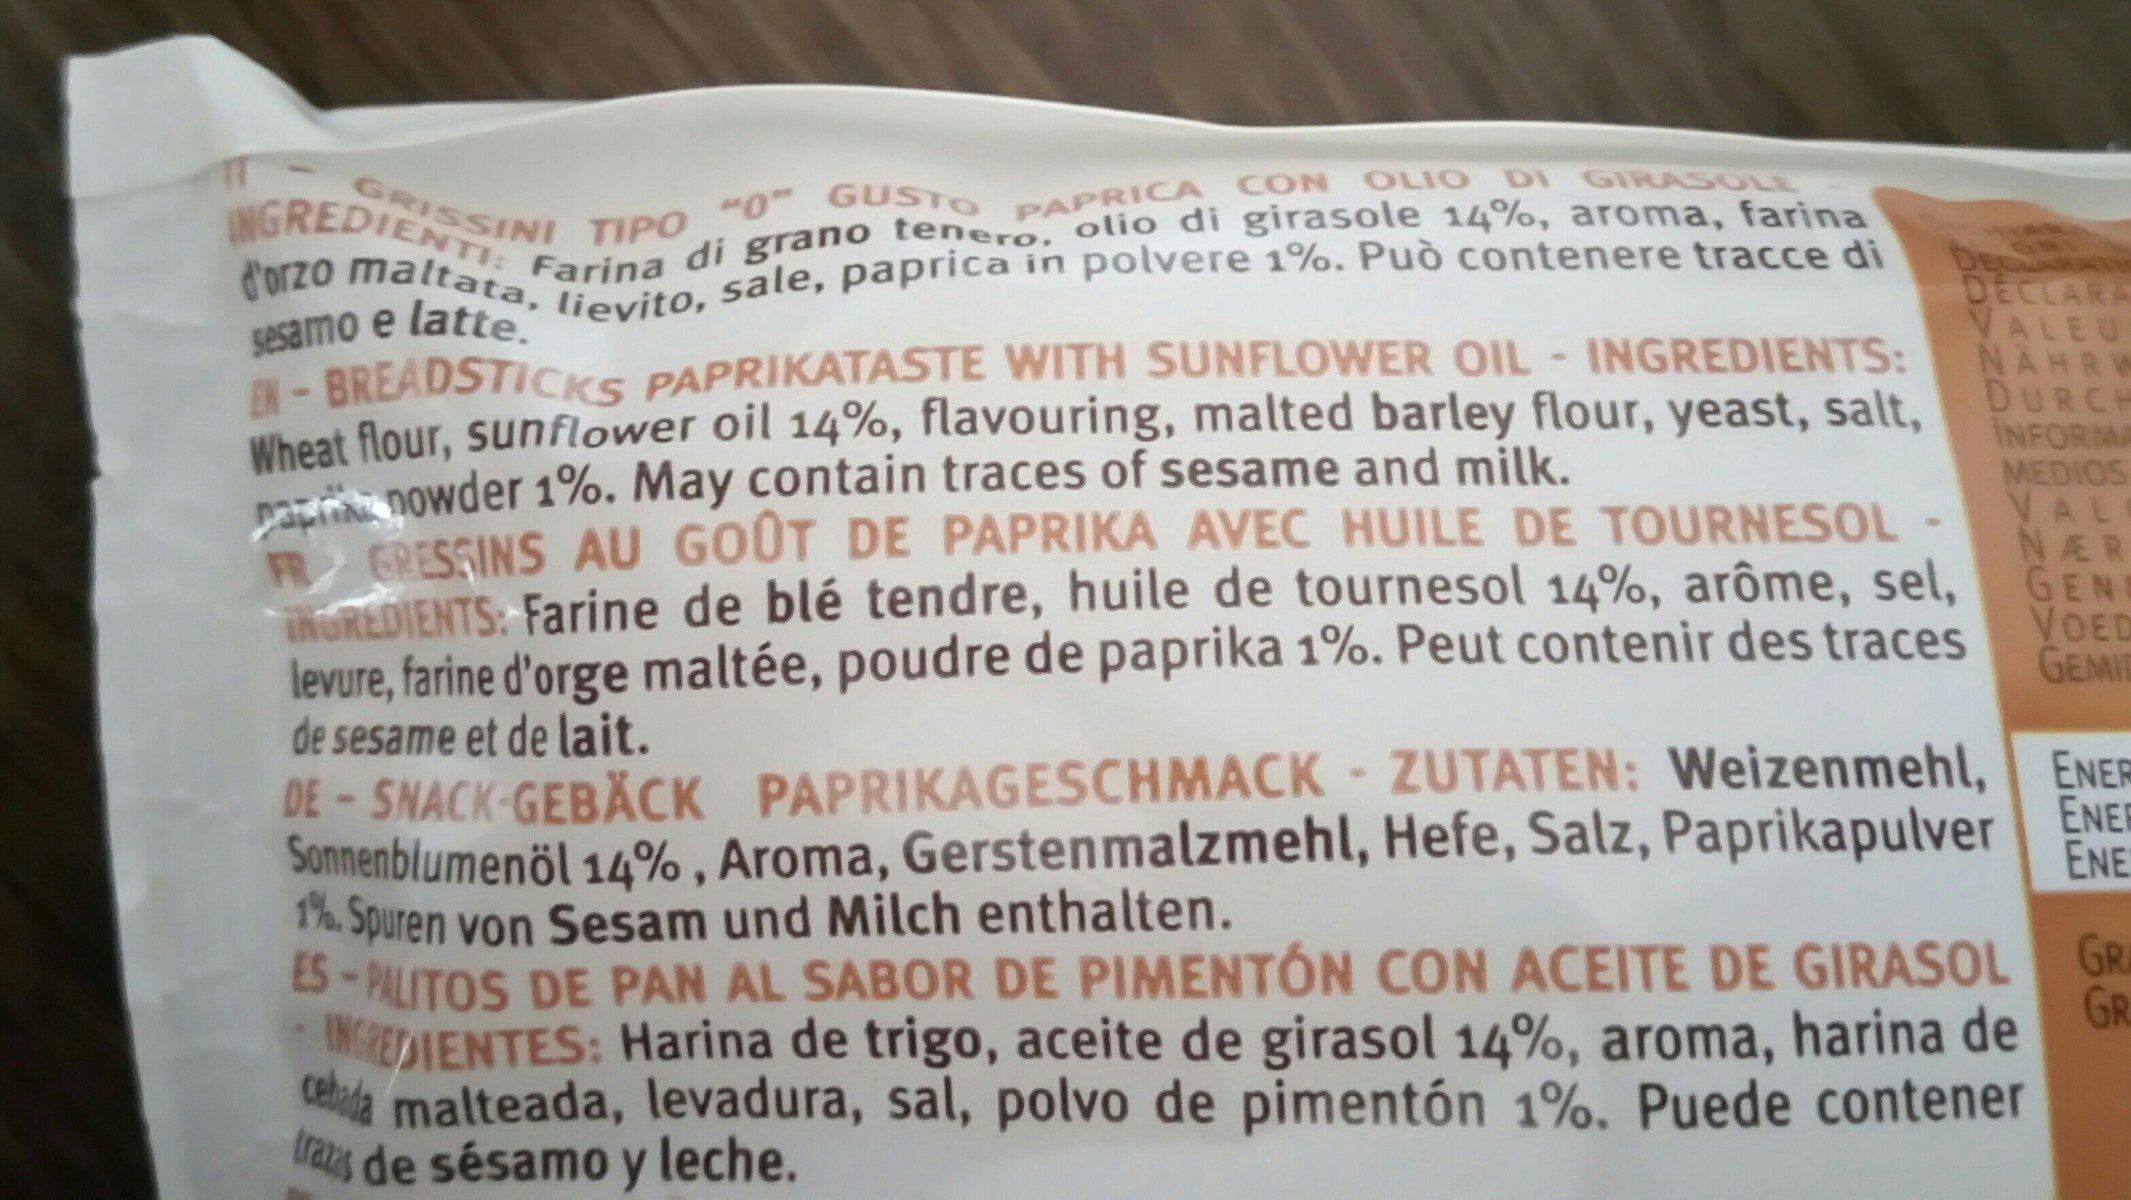 Mini Grissini paprika - Ingredients - fr